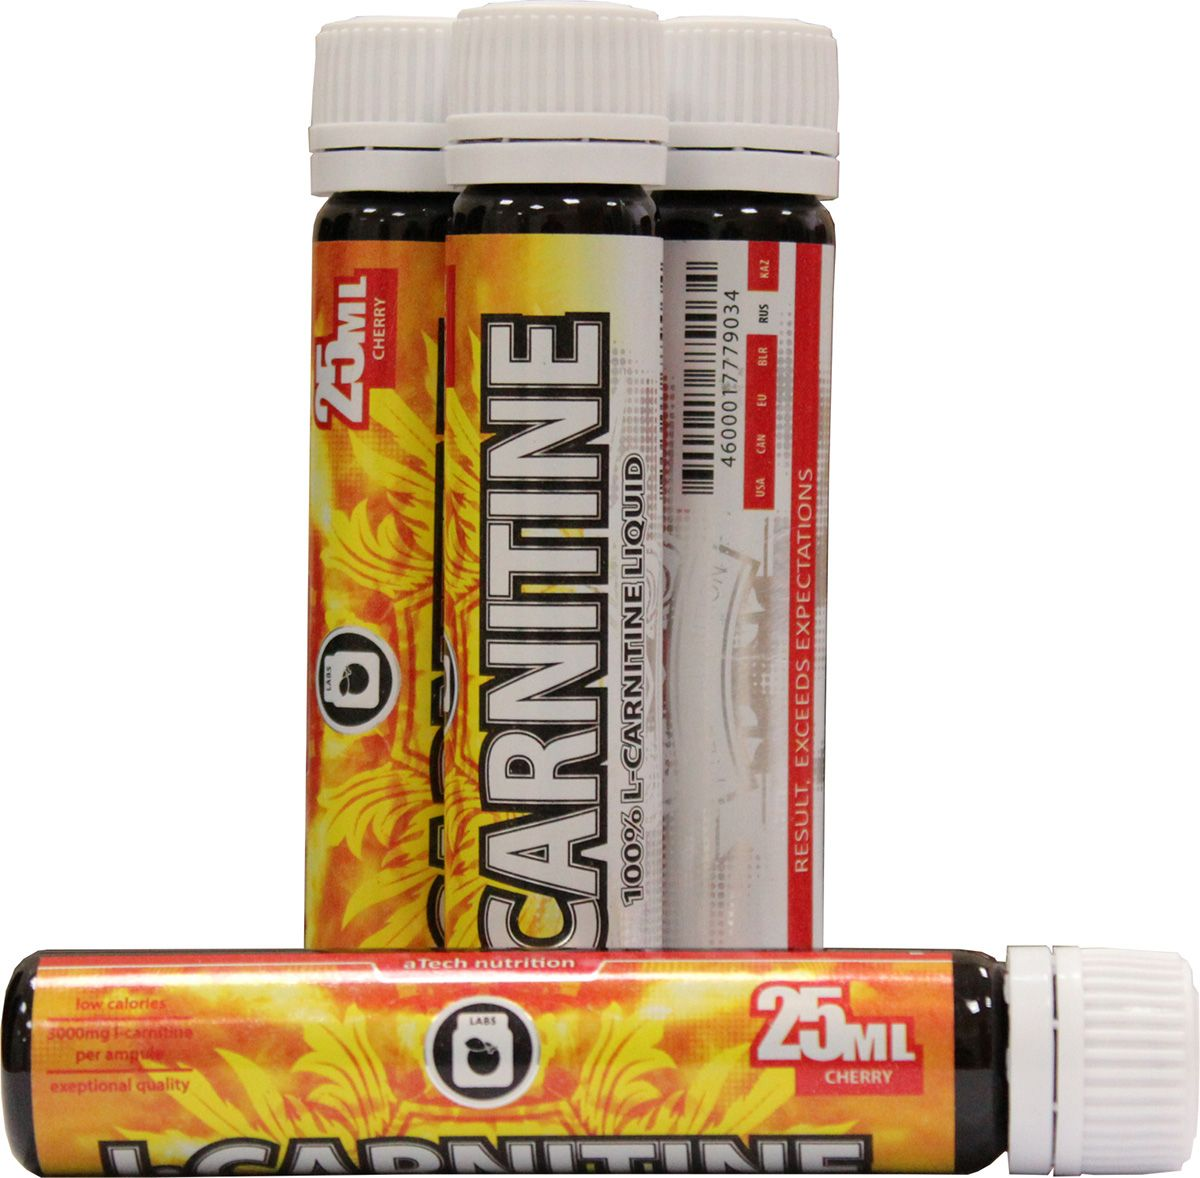 L-карнитин aTech Nutrition L-Carnitine 3000 Liquid, вишня, 25 мл l карнитин sport technology nutrition l carnitine guarana 0 5 л